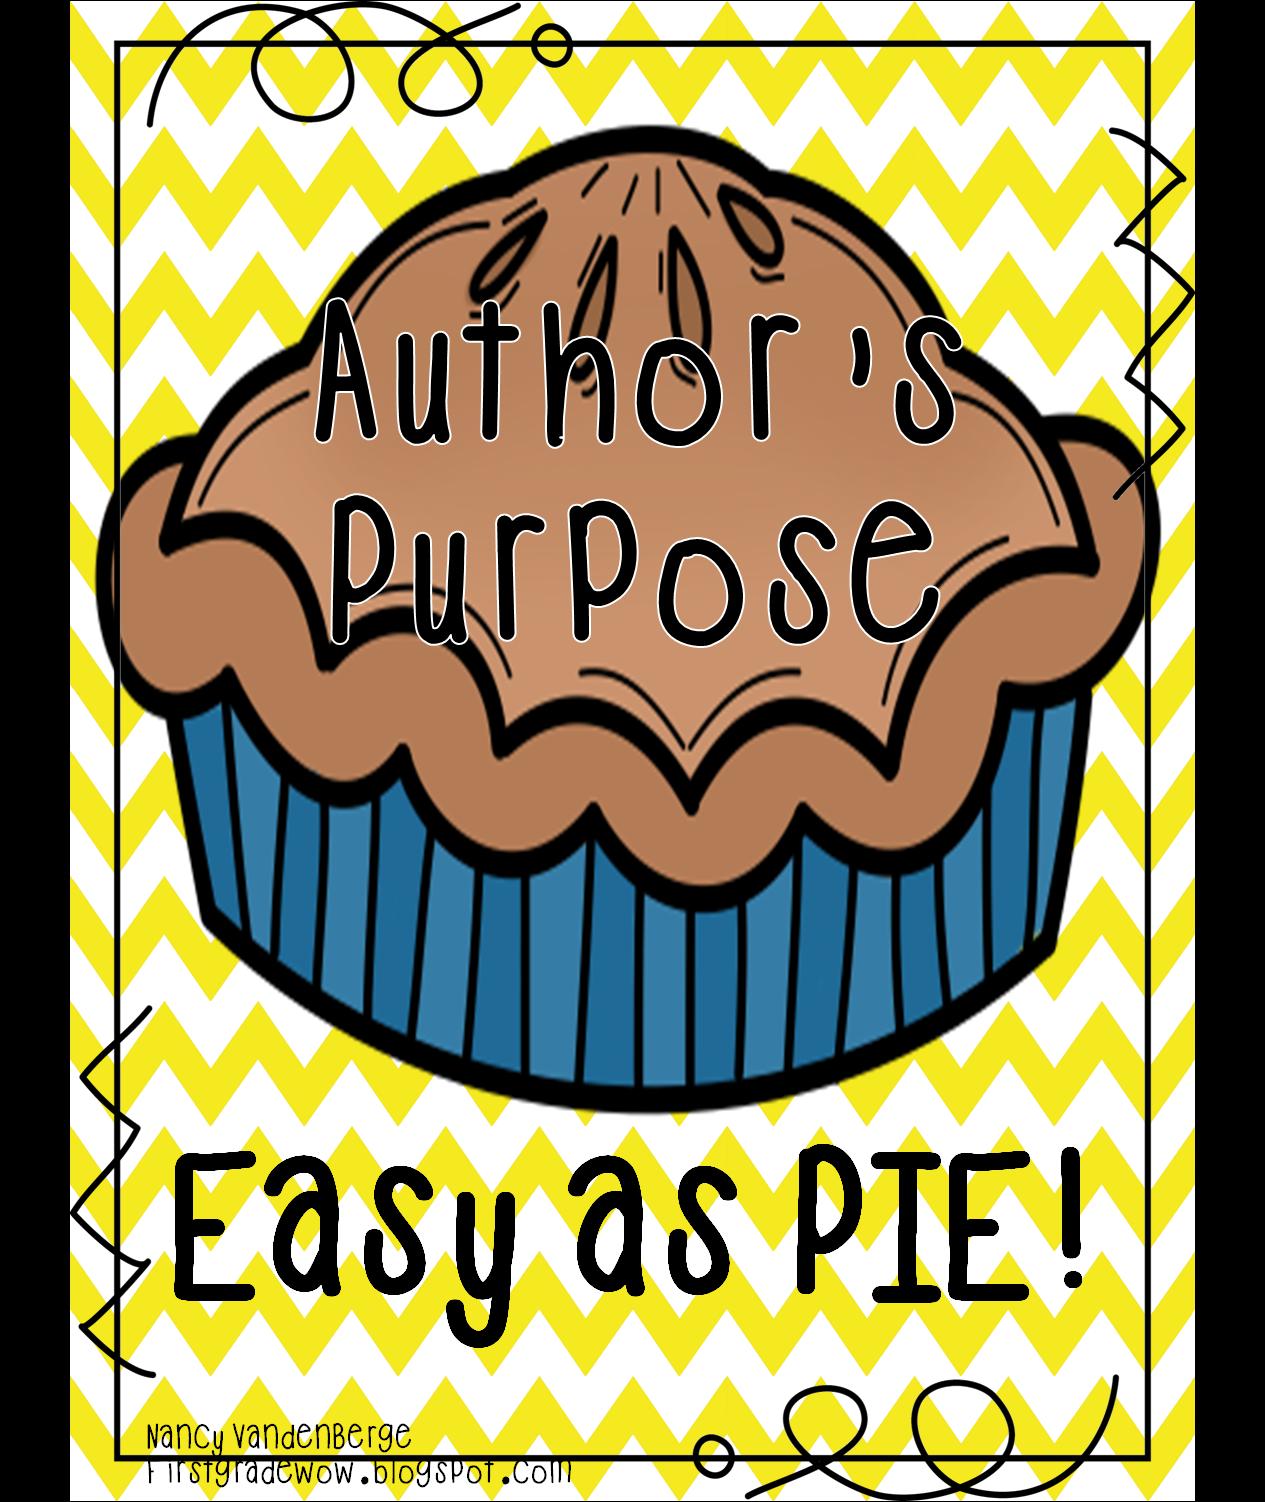 53 best Authors Purpose images on Pinterest | Teaching ideas ...